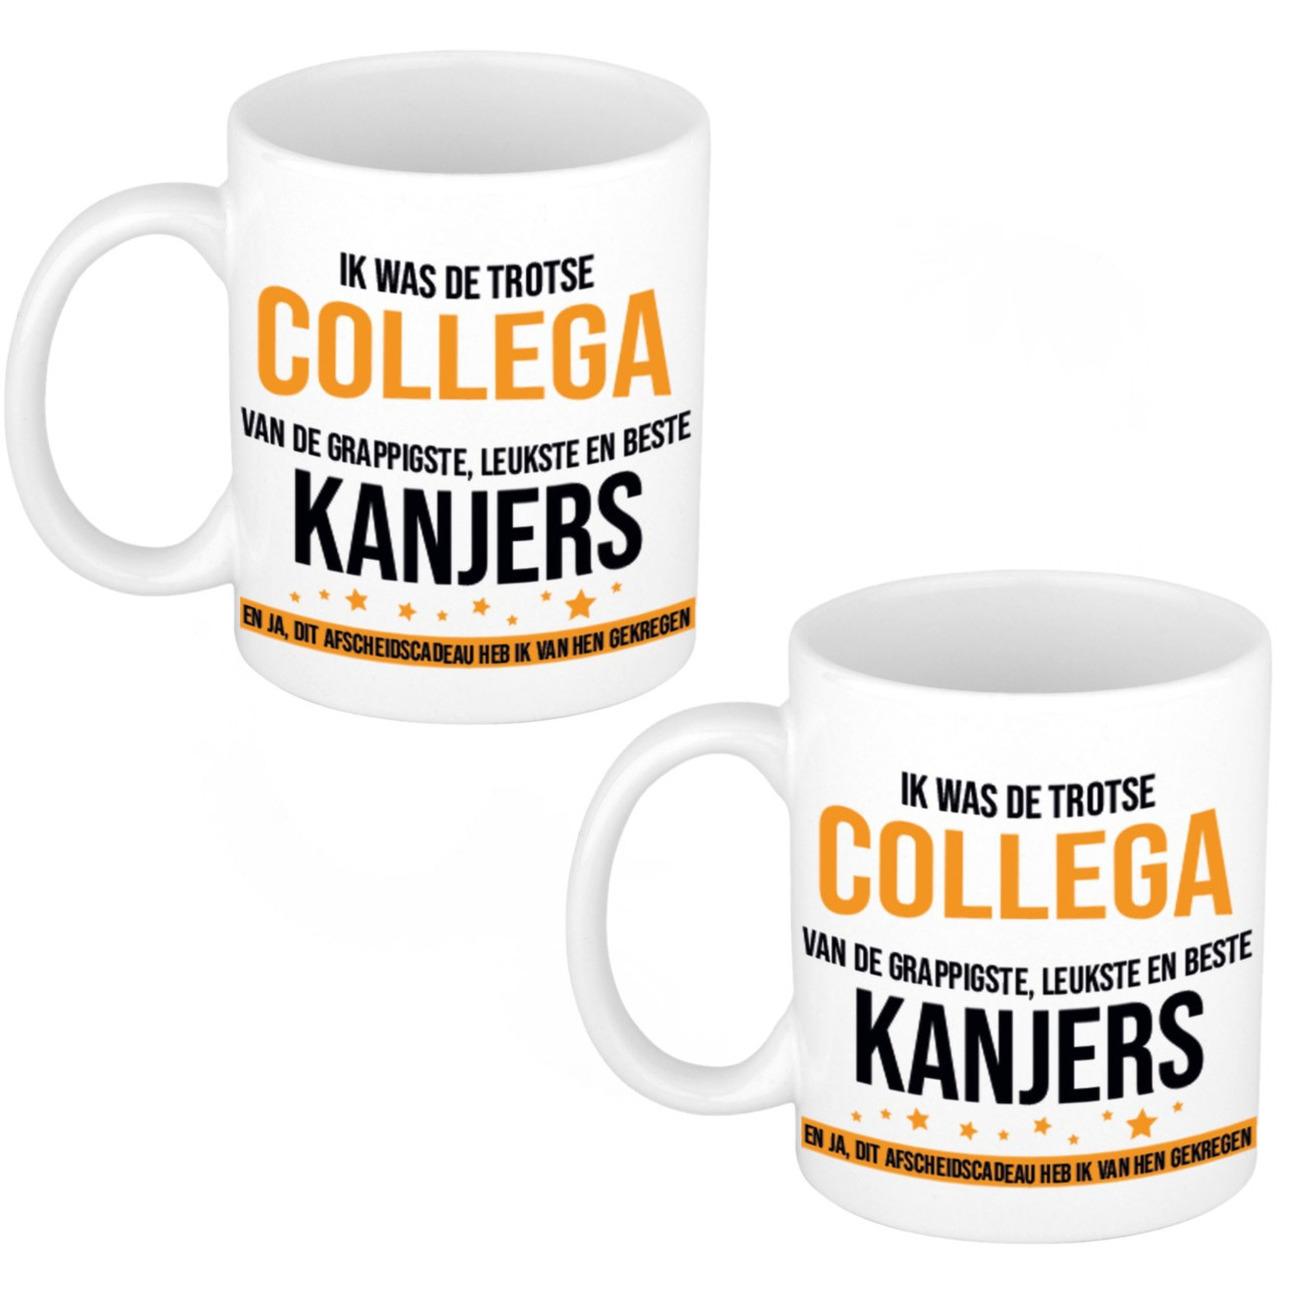 4x stuks trotse collega kanjers afscheidscadeau koffiemok - theebeker 300 ml